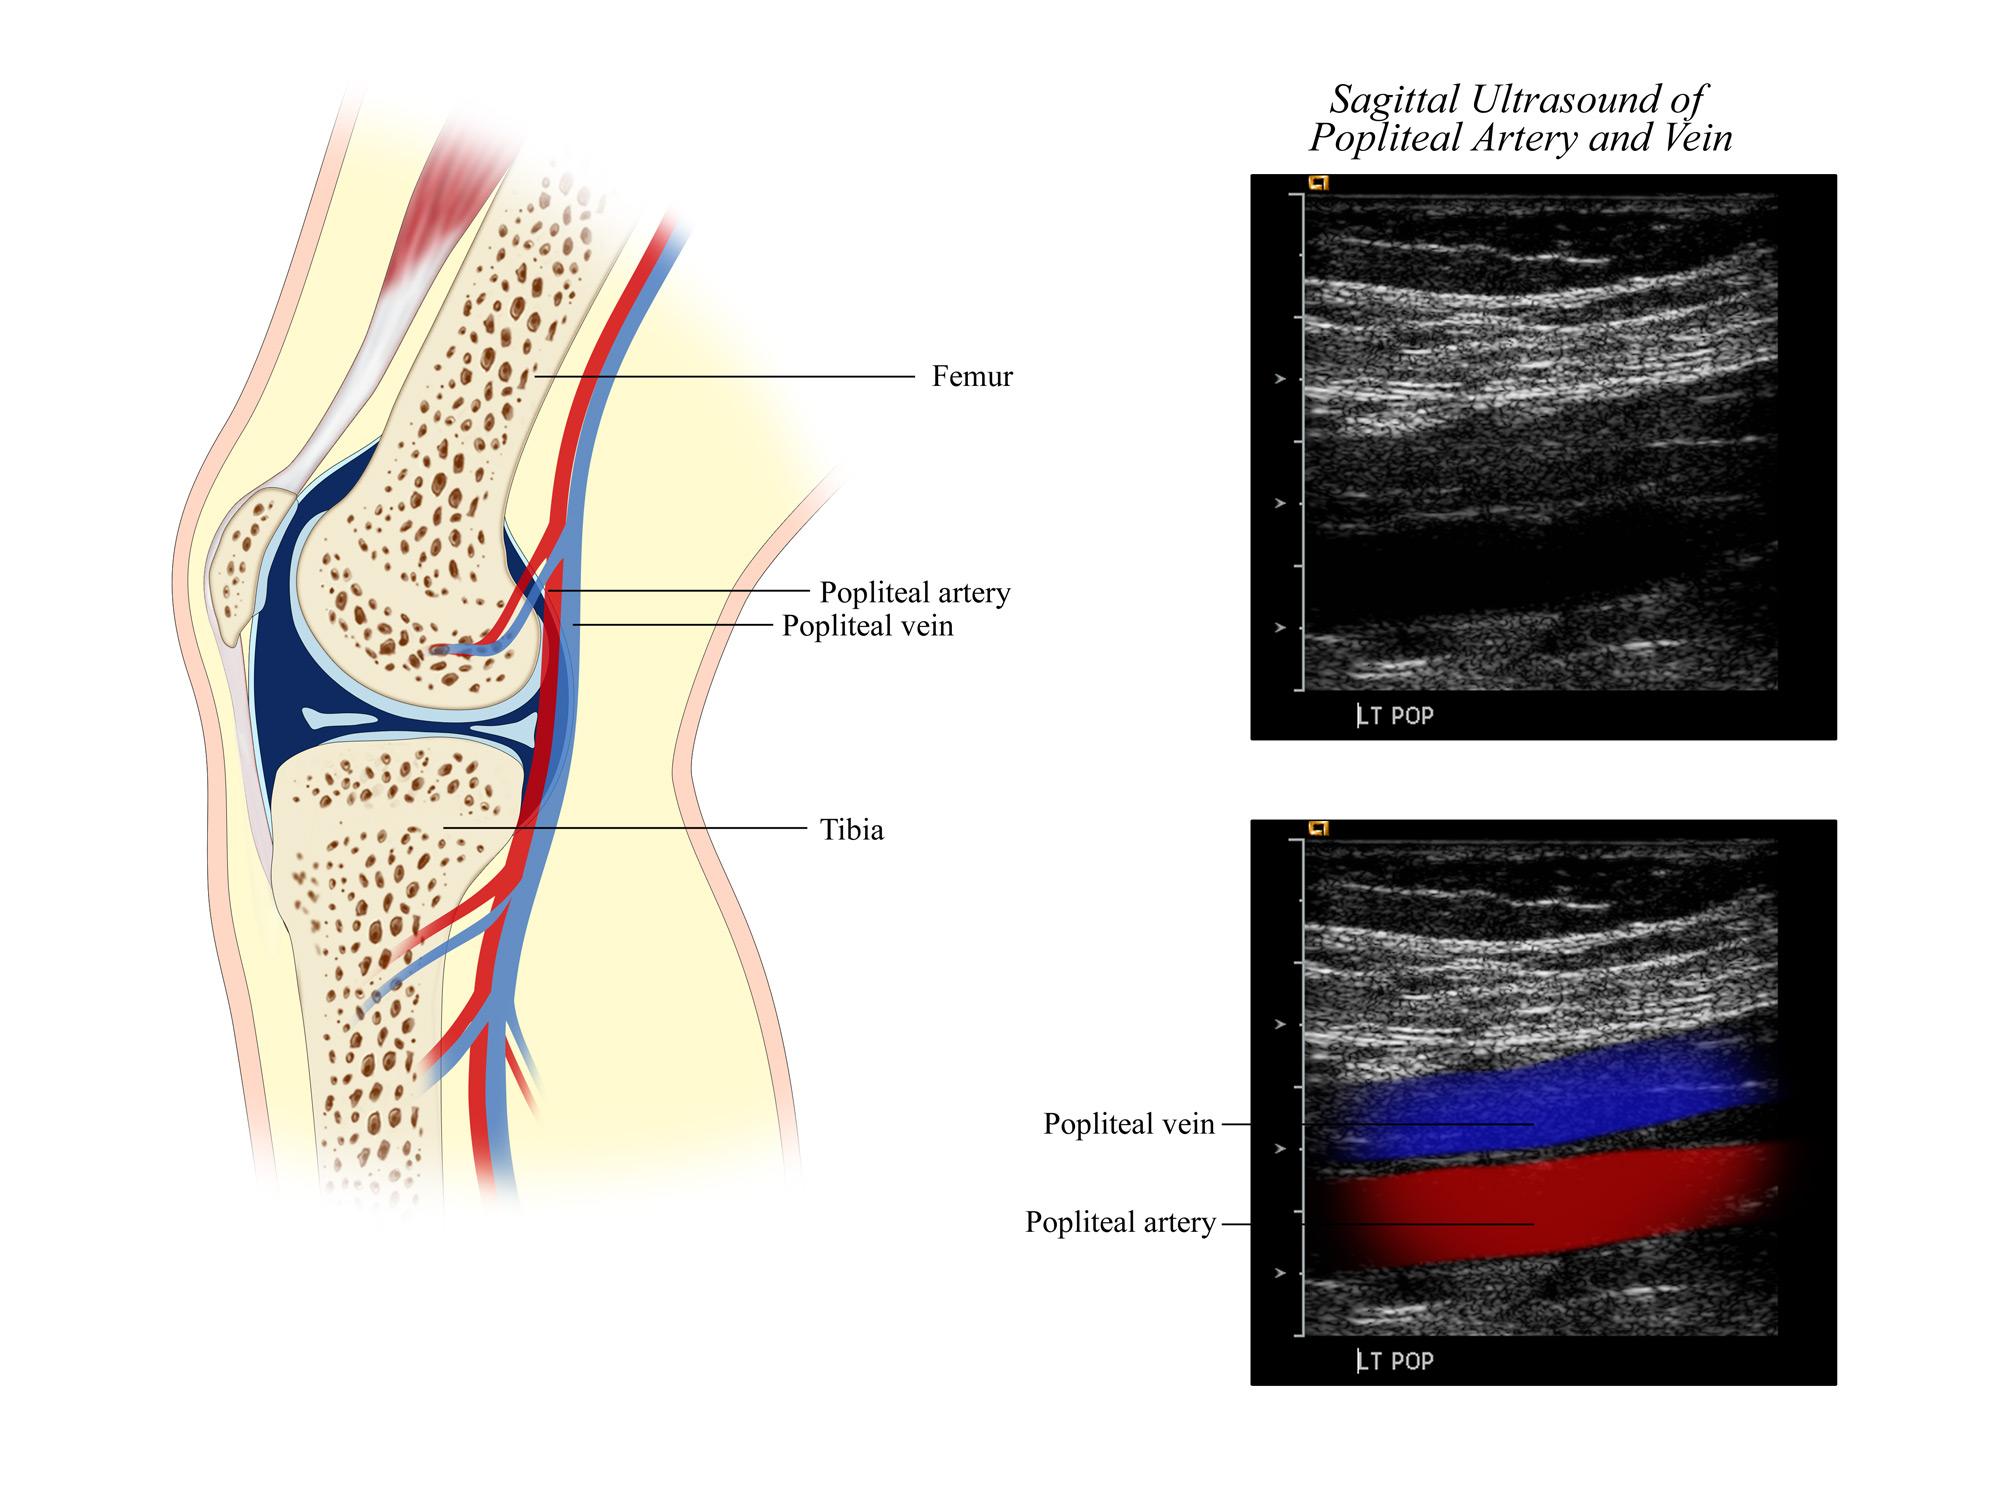 Popliteal Artery and Vein